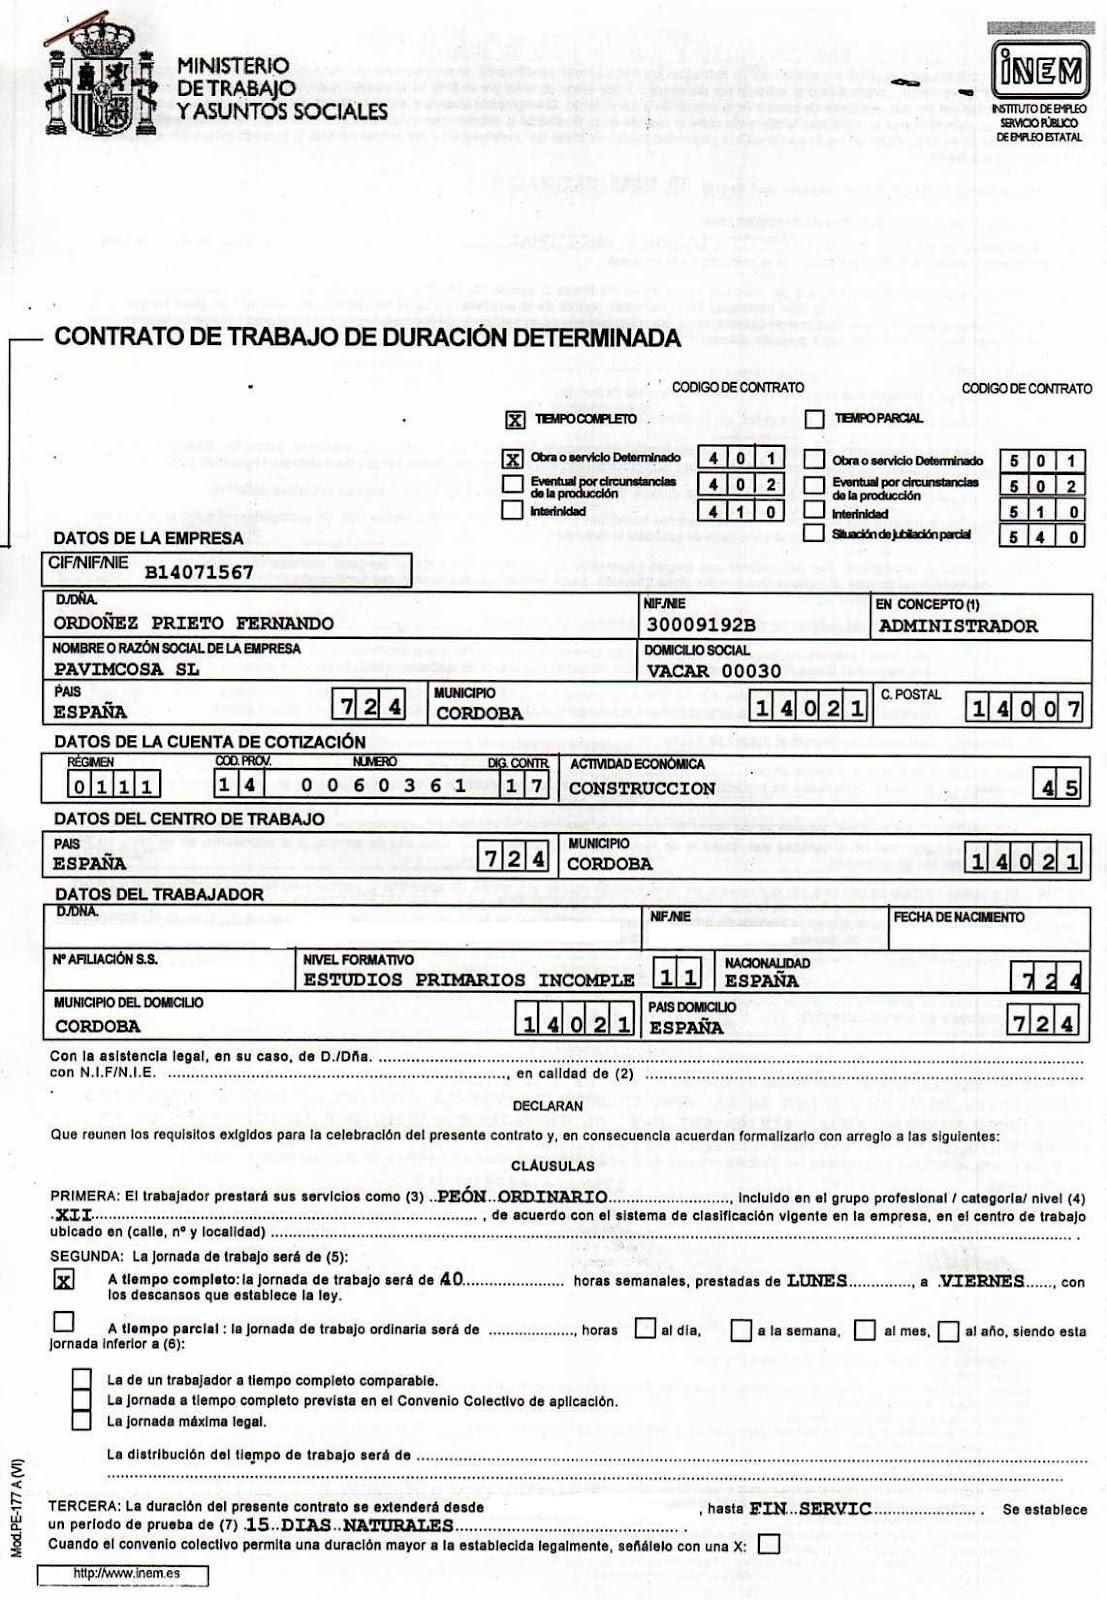 Contratos de trabajo modelos 2012 for Modelo contrato laboral